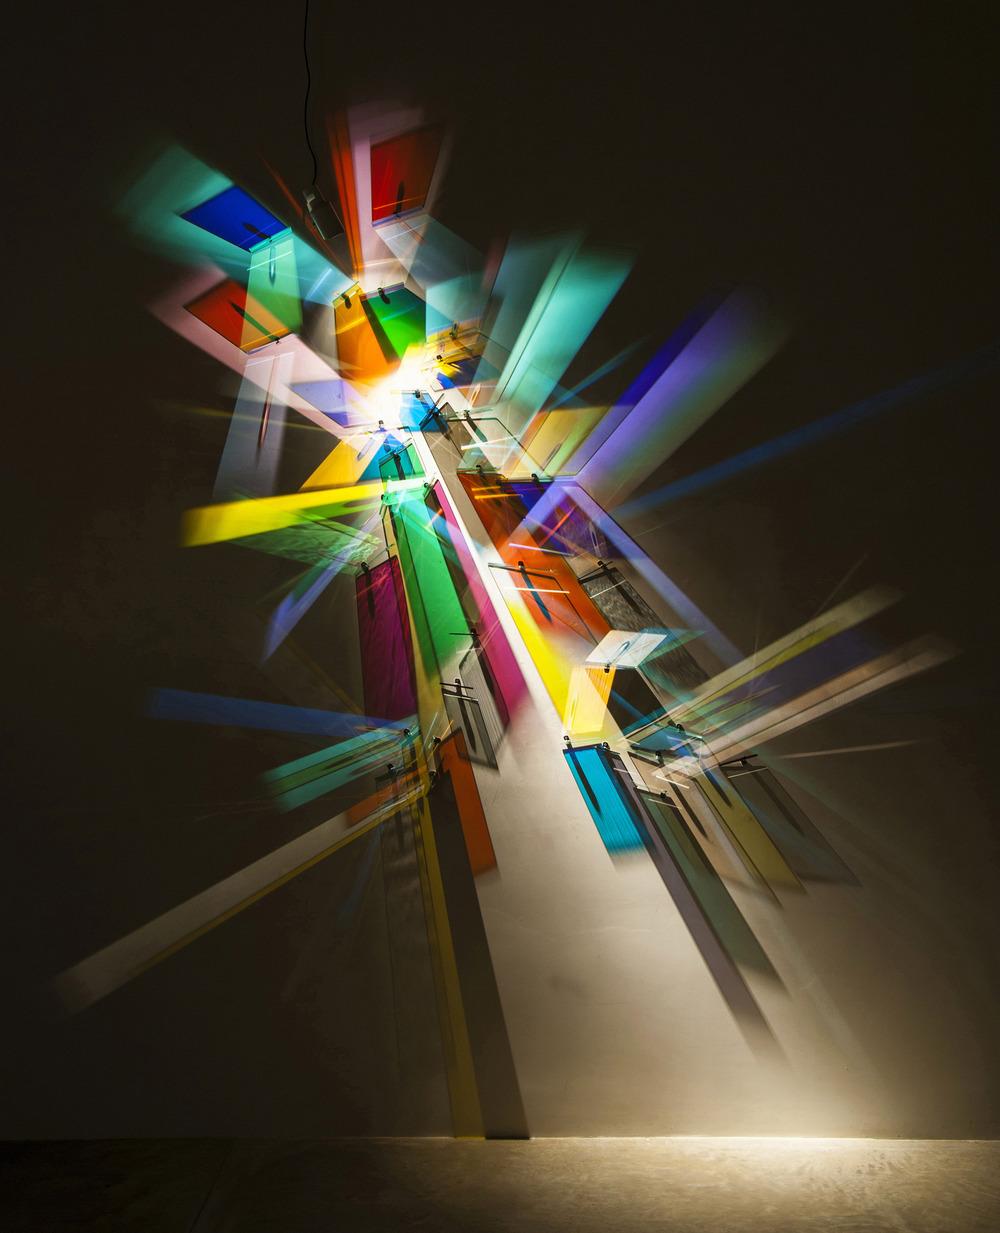 Light_Painting_by_Stephen_Knapp_10